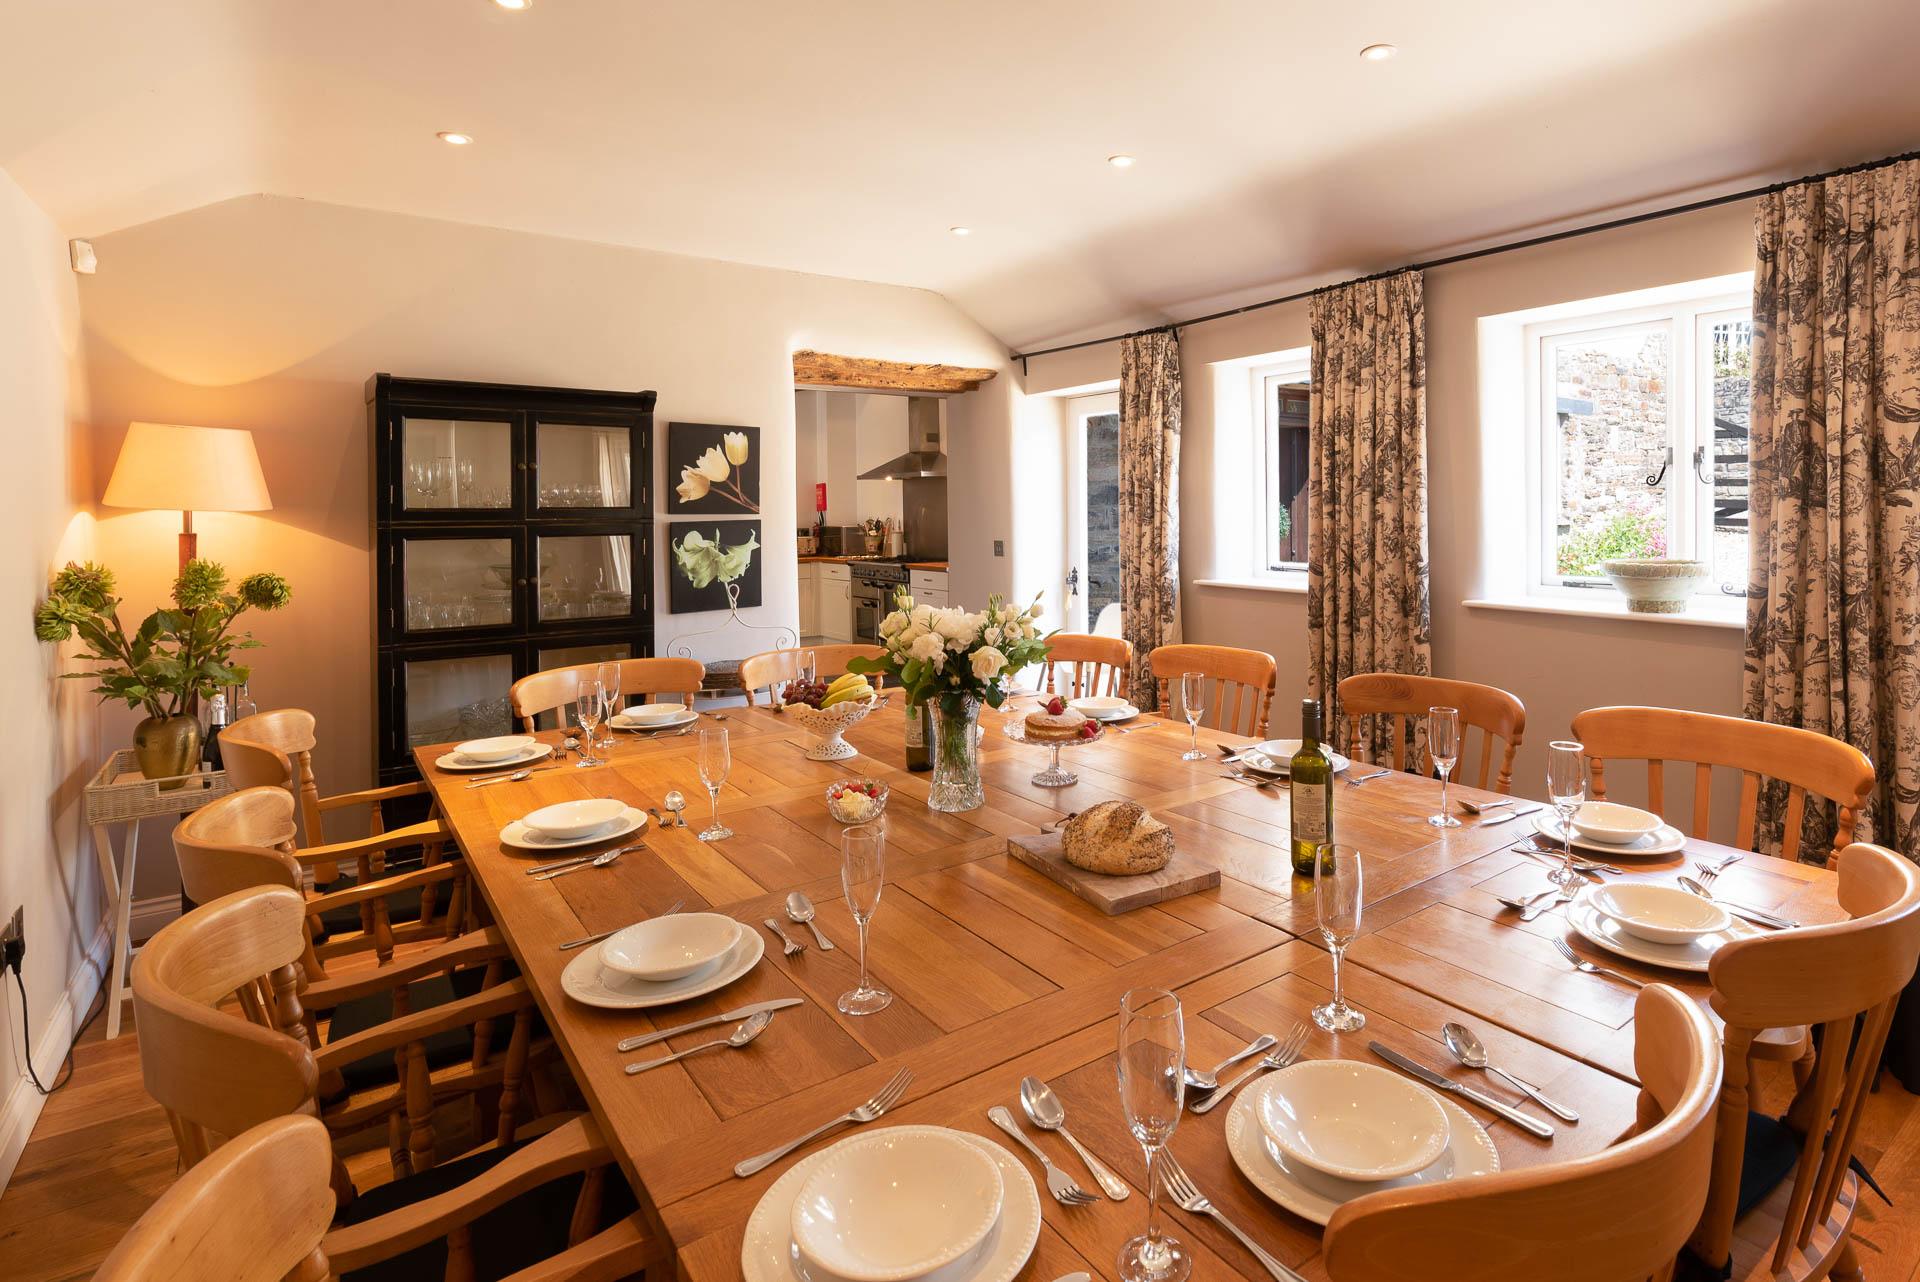 Remarkable Large Luxury Holiday Let In North Devon Download Free Architecture Designs Scobabritishbridgeorg